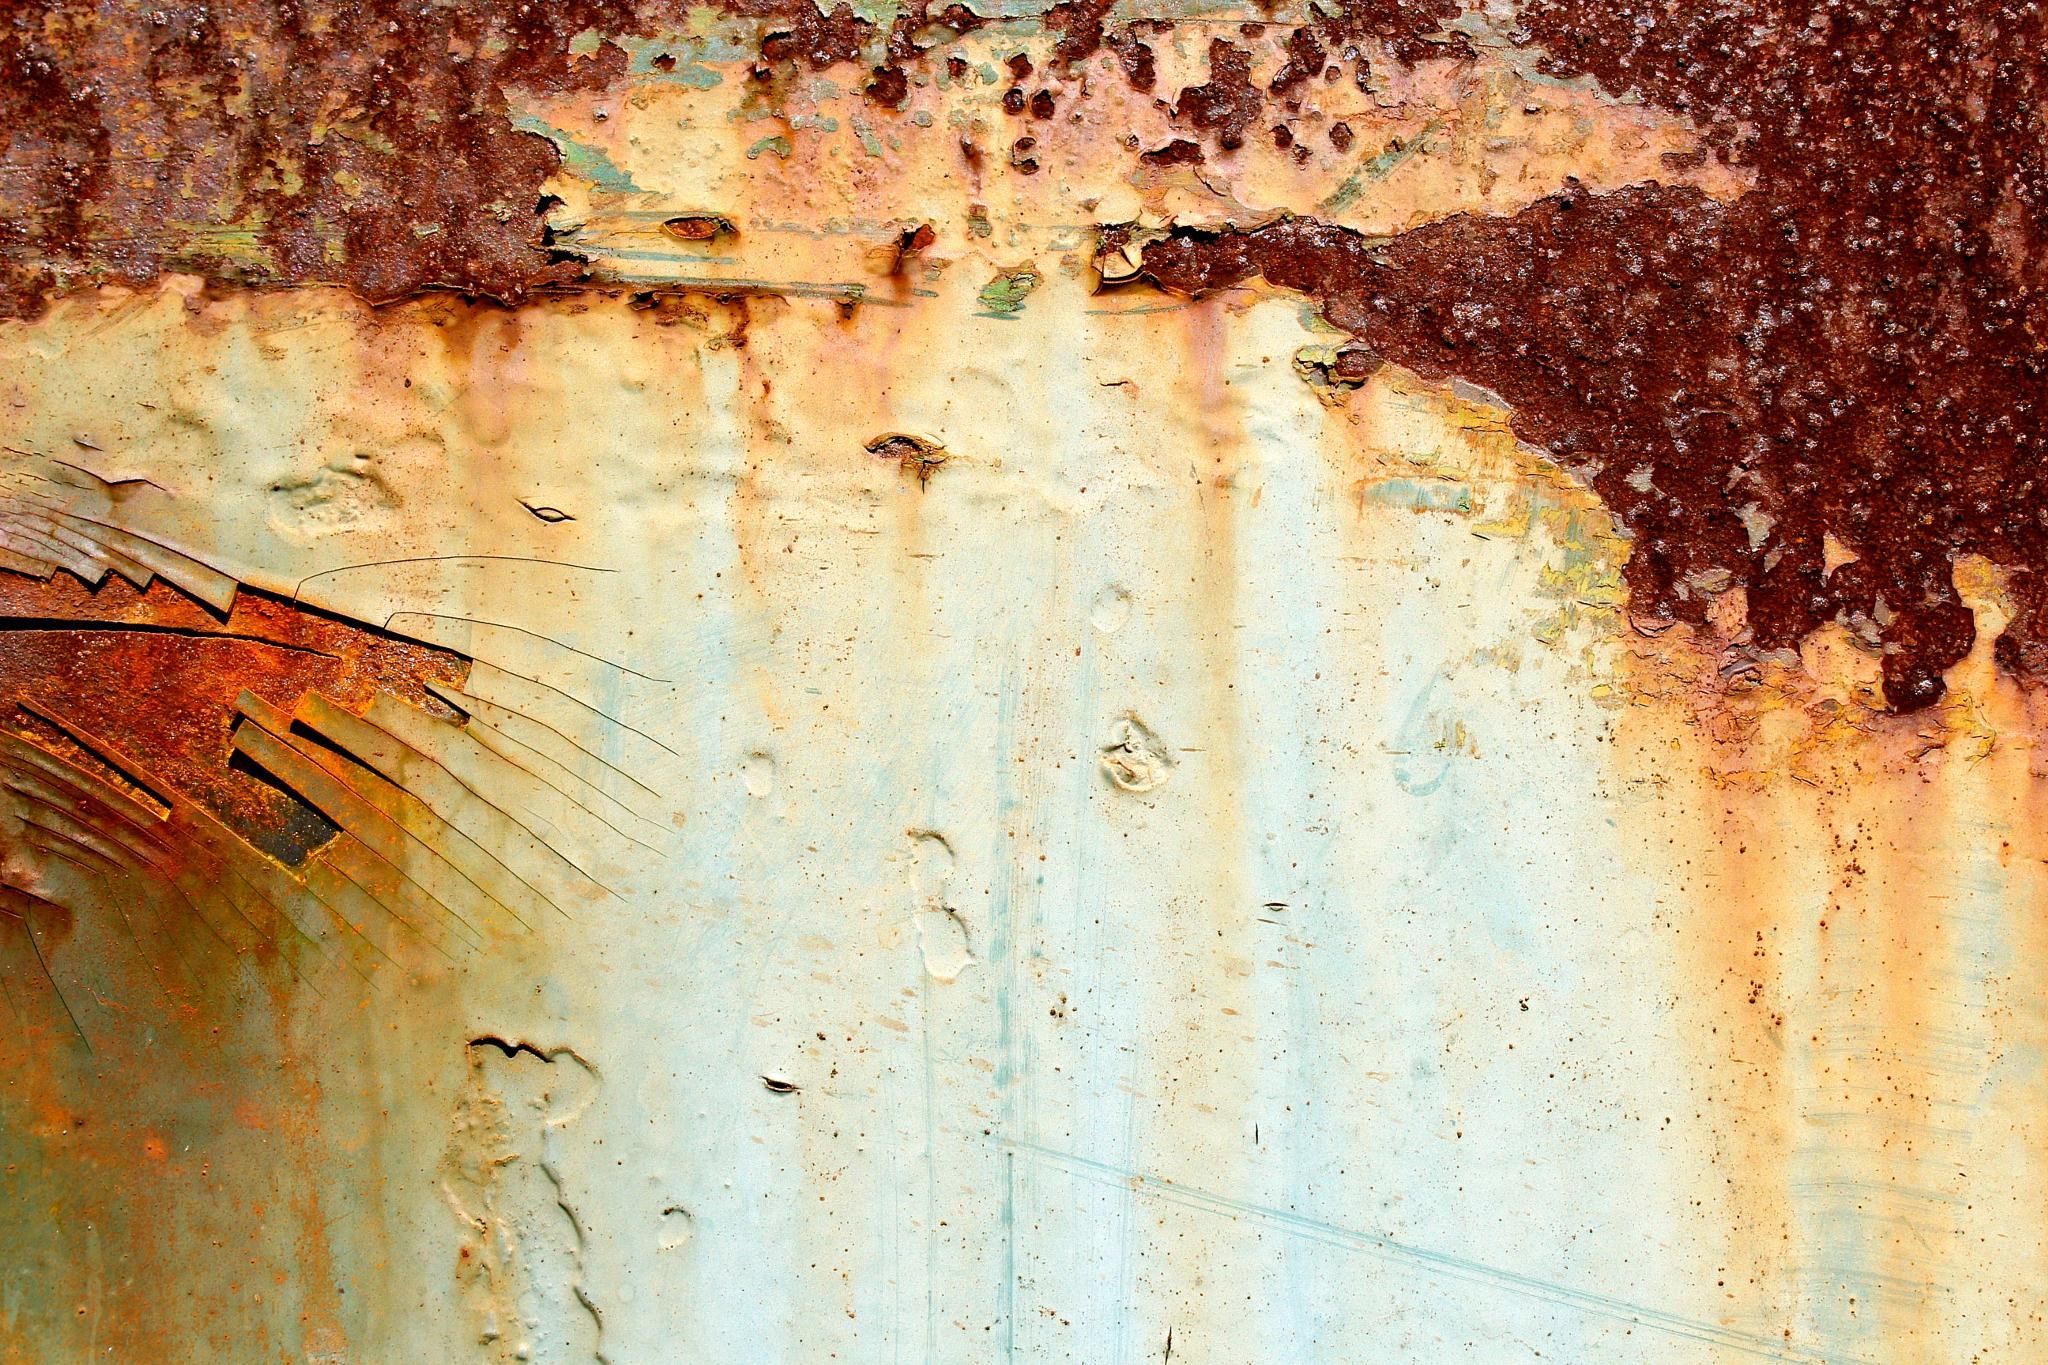 Rusty Sunset by cyndee